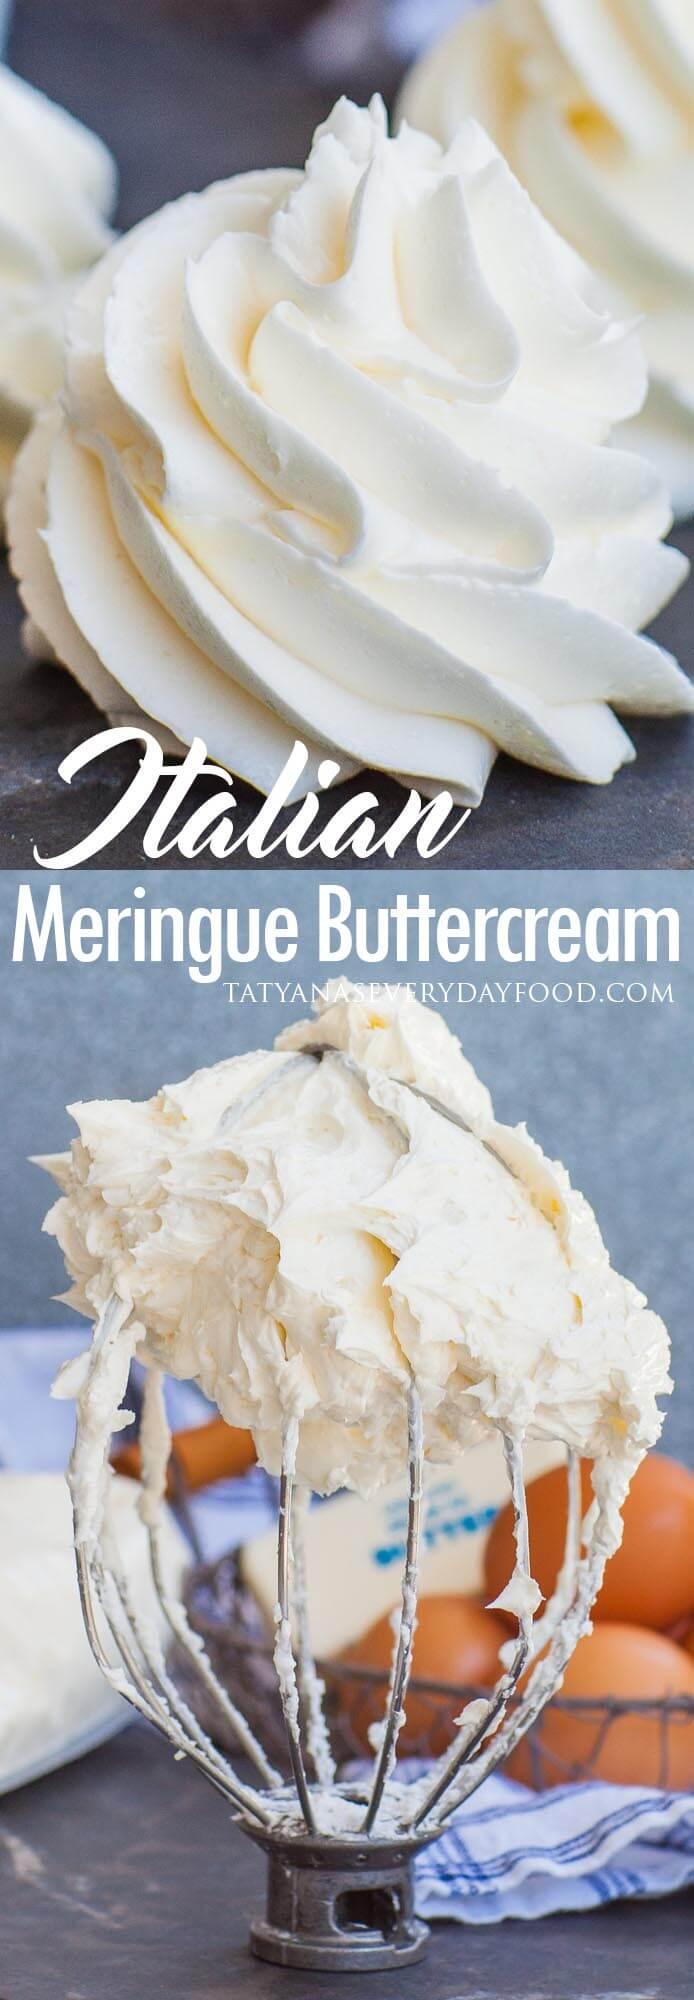 Italian Meringue Buttercream video recipe